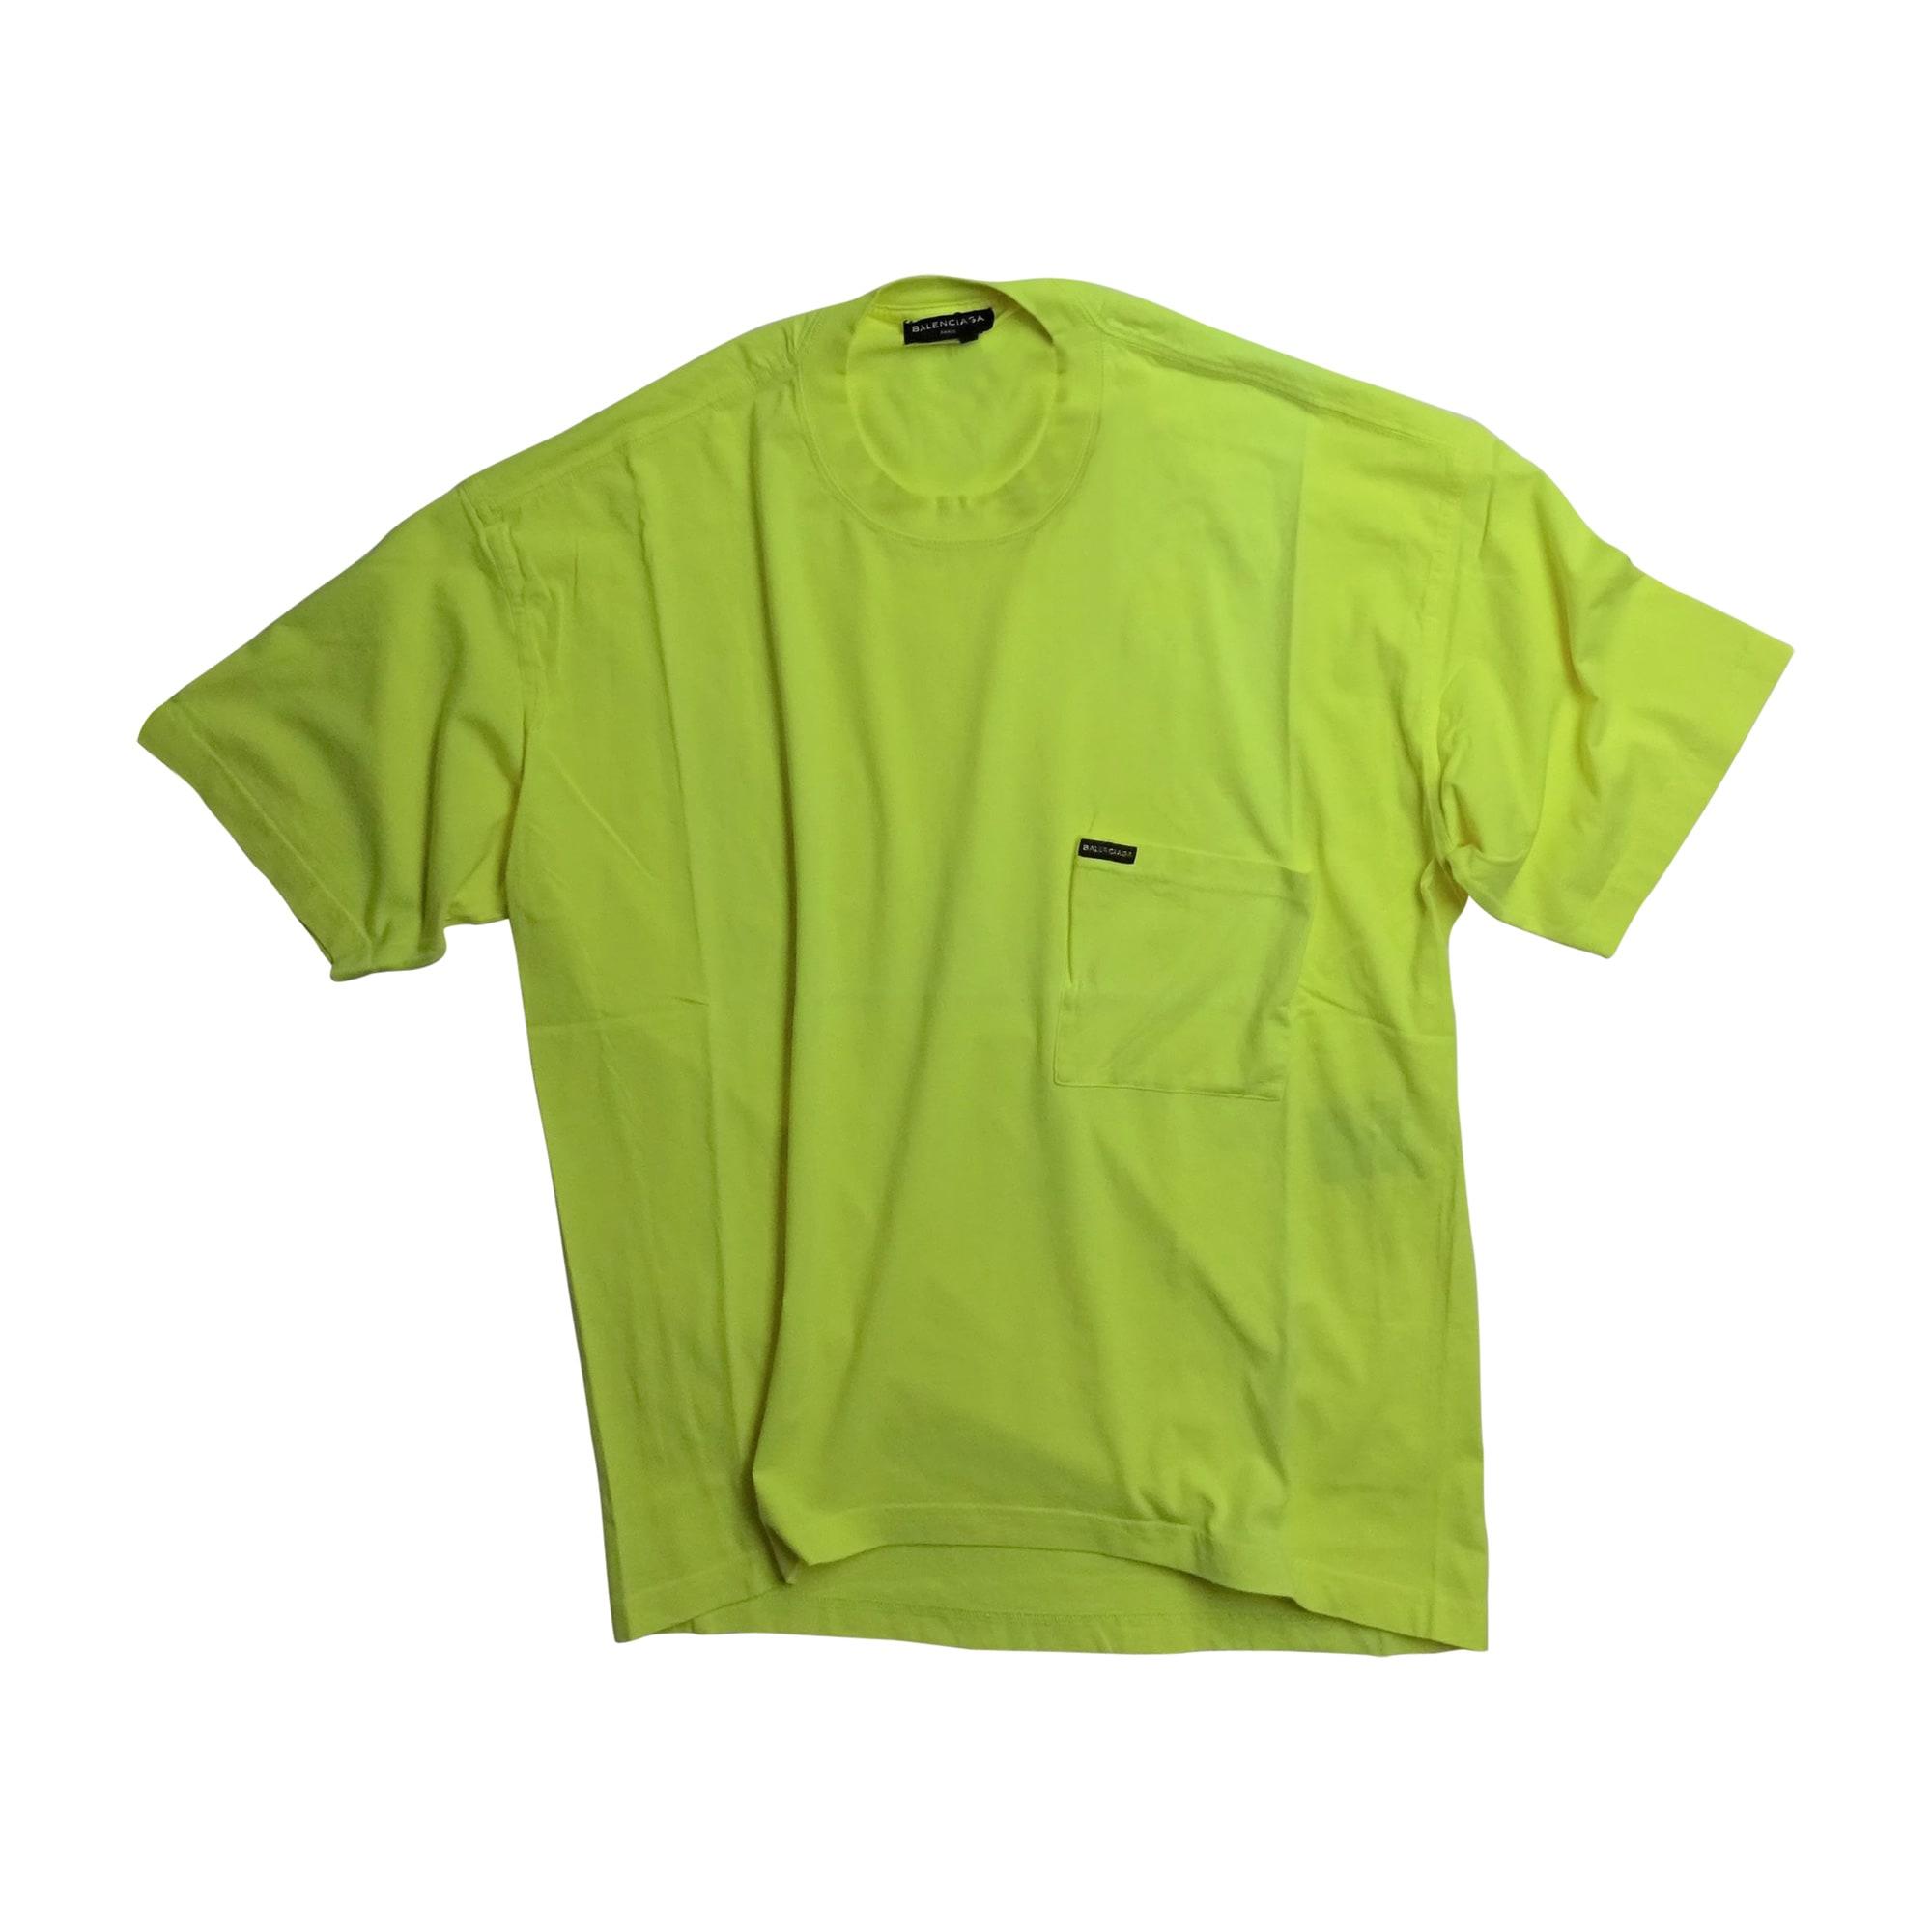 T-shirt BALENCIAGA Yellow